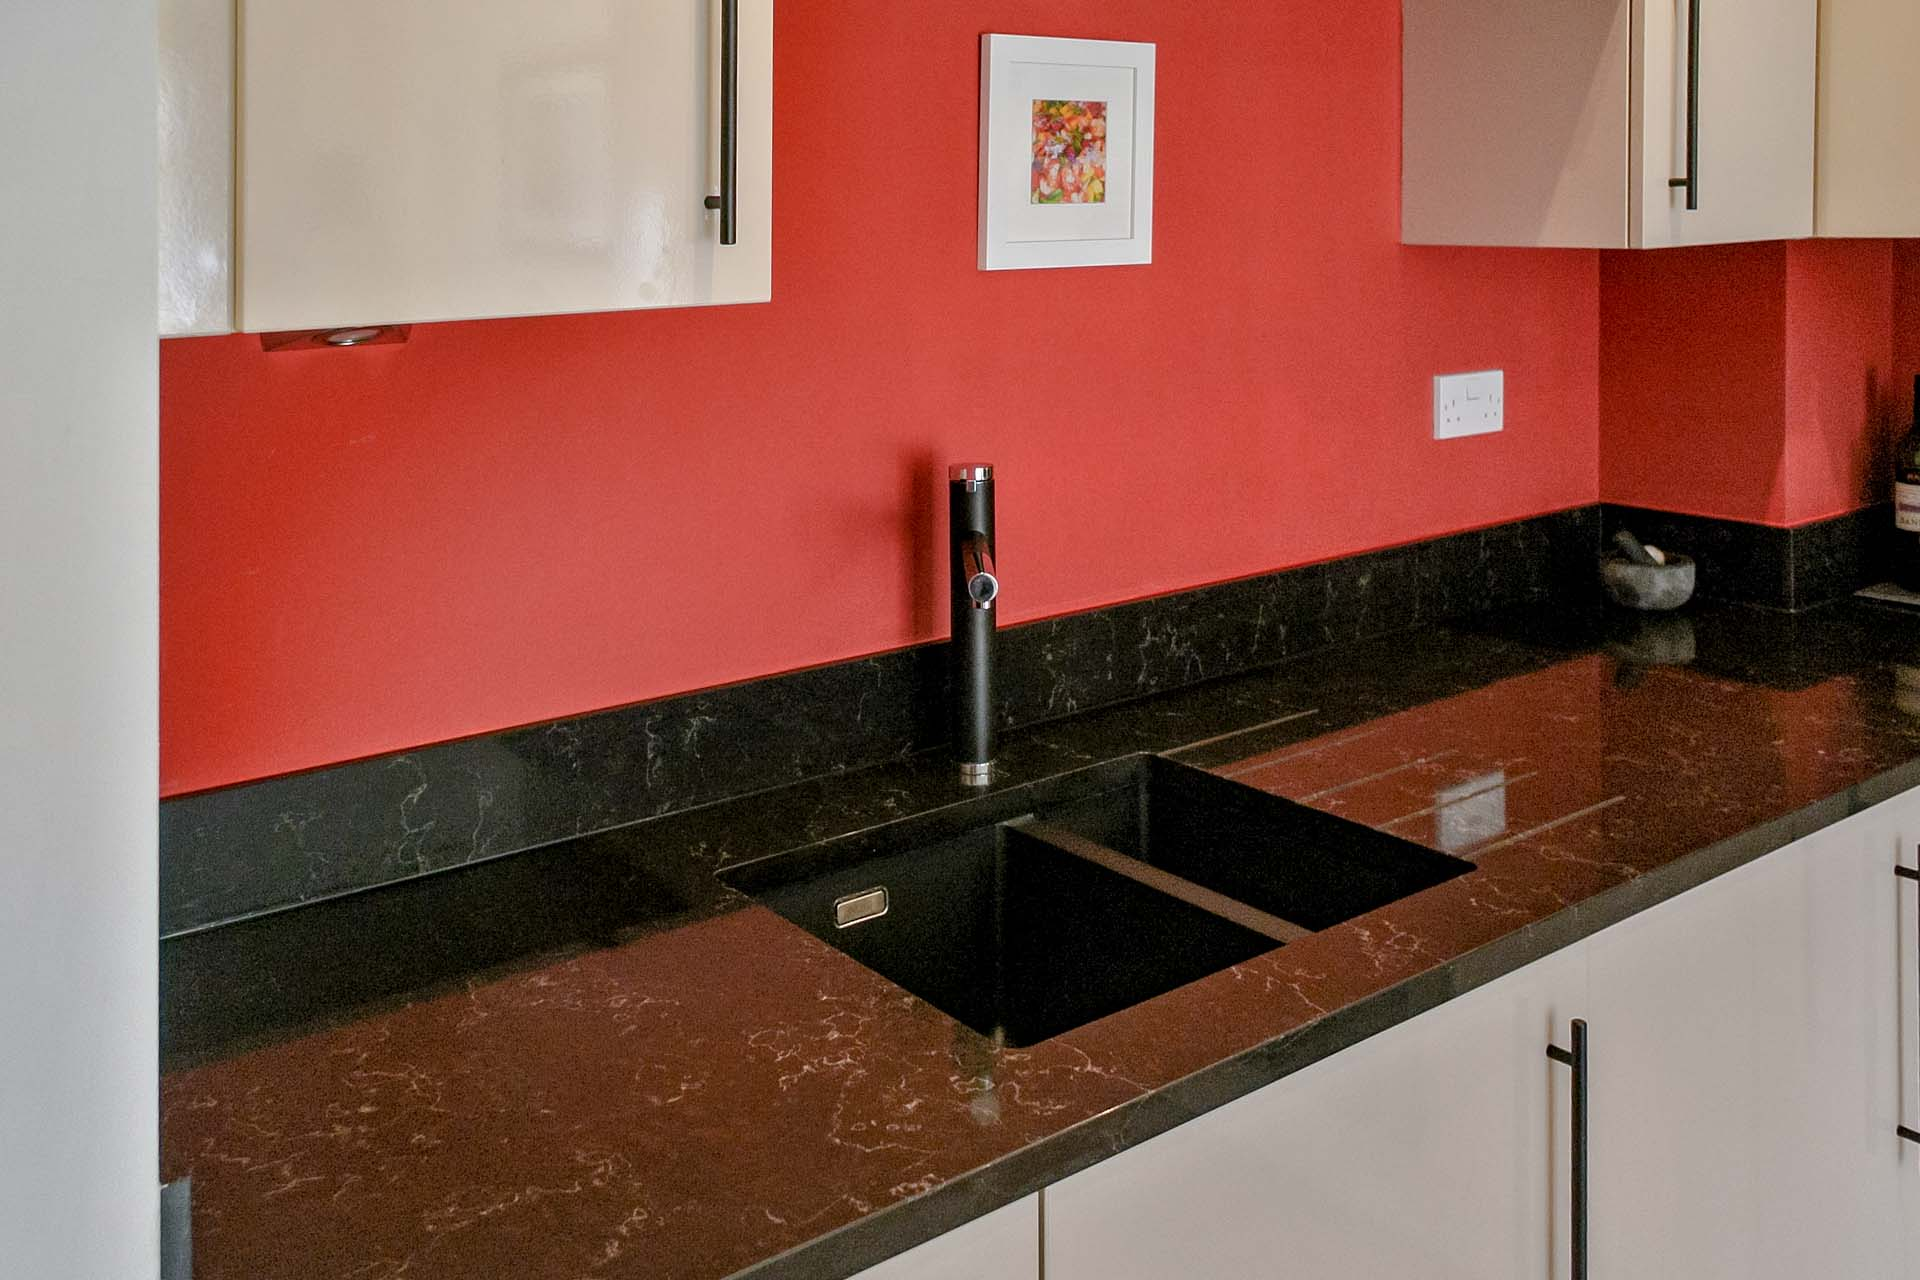 Unistone Java Black Noir Quartz Worktops Surrey Reigate Granite Franke SID160 Tectonite sink 094122